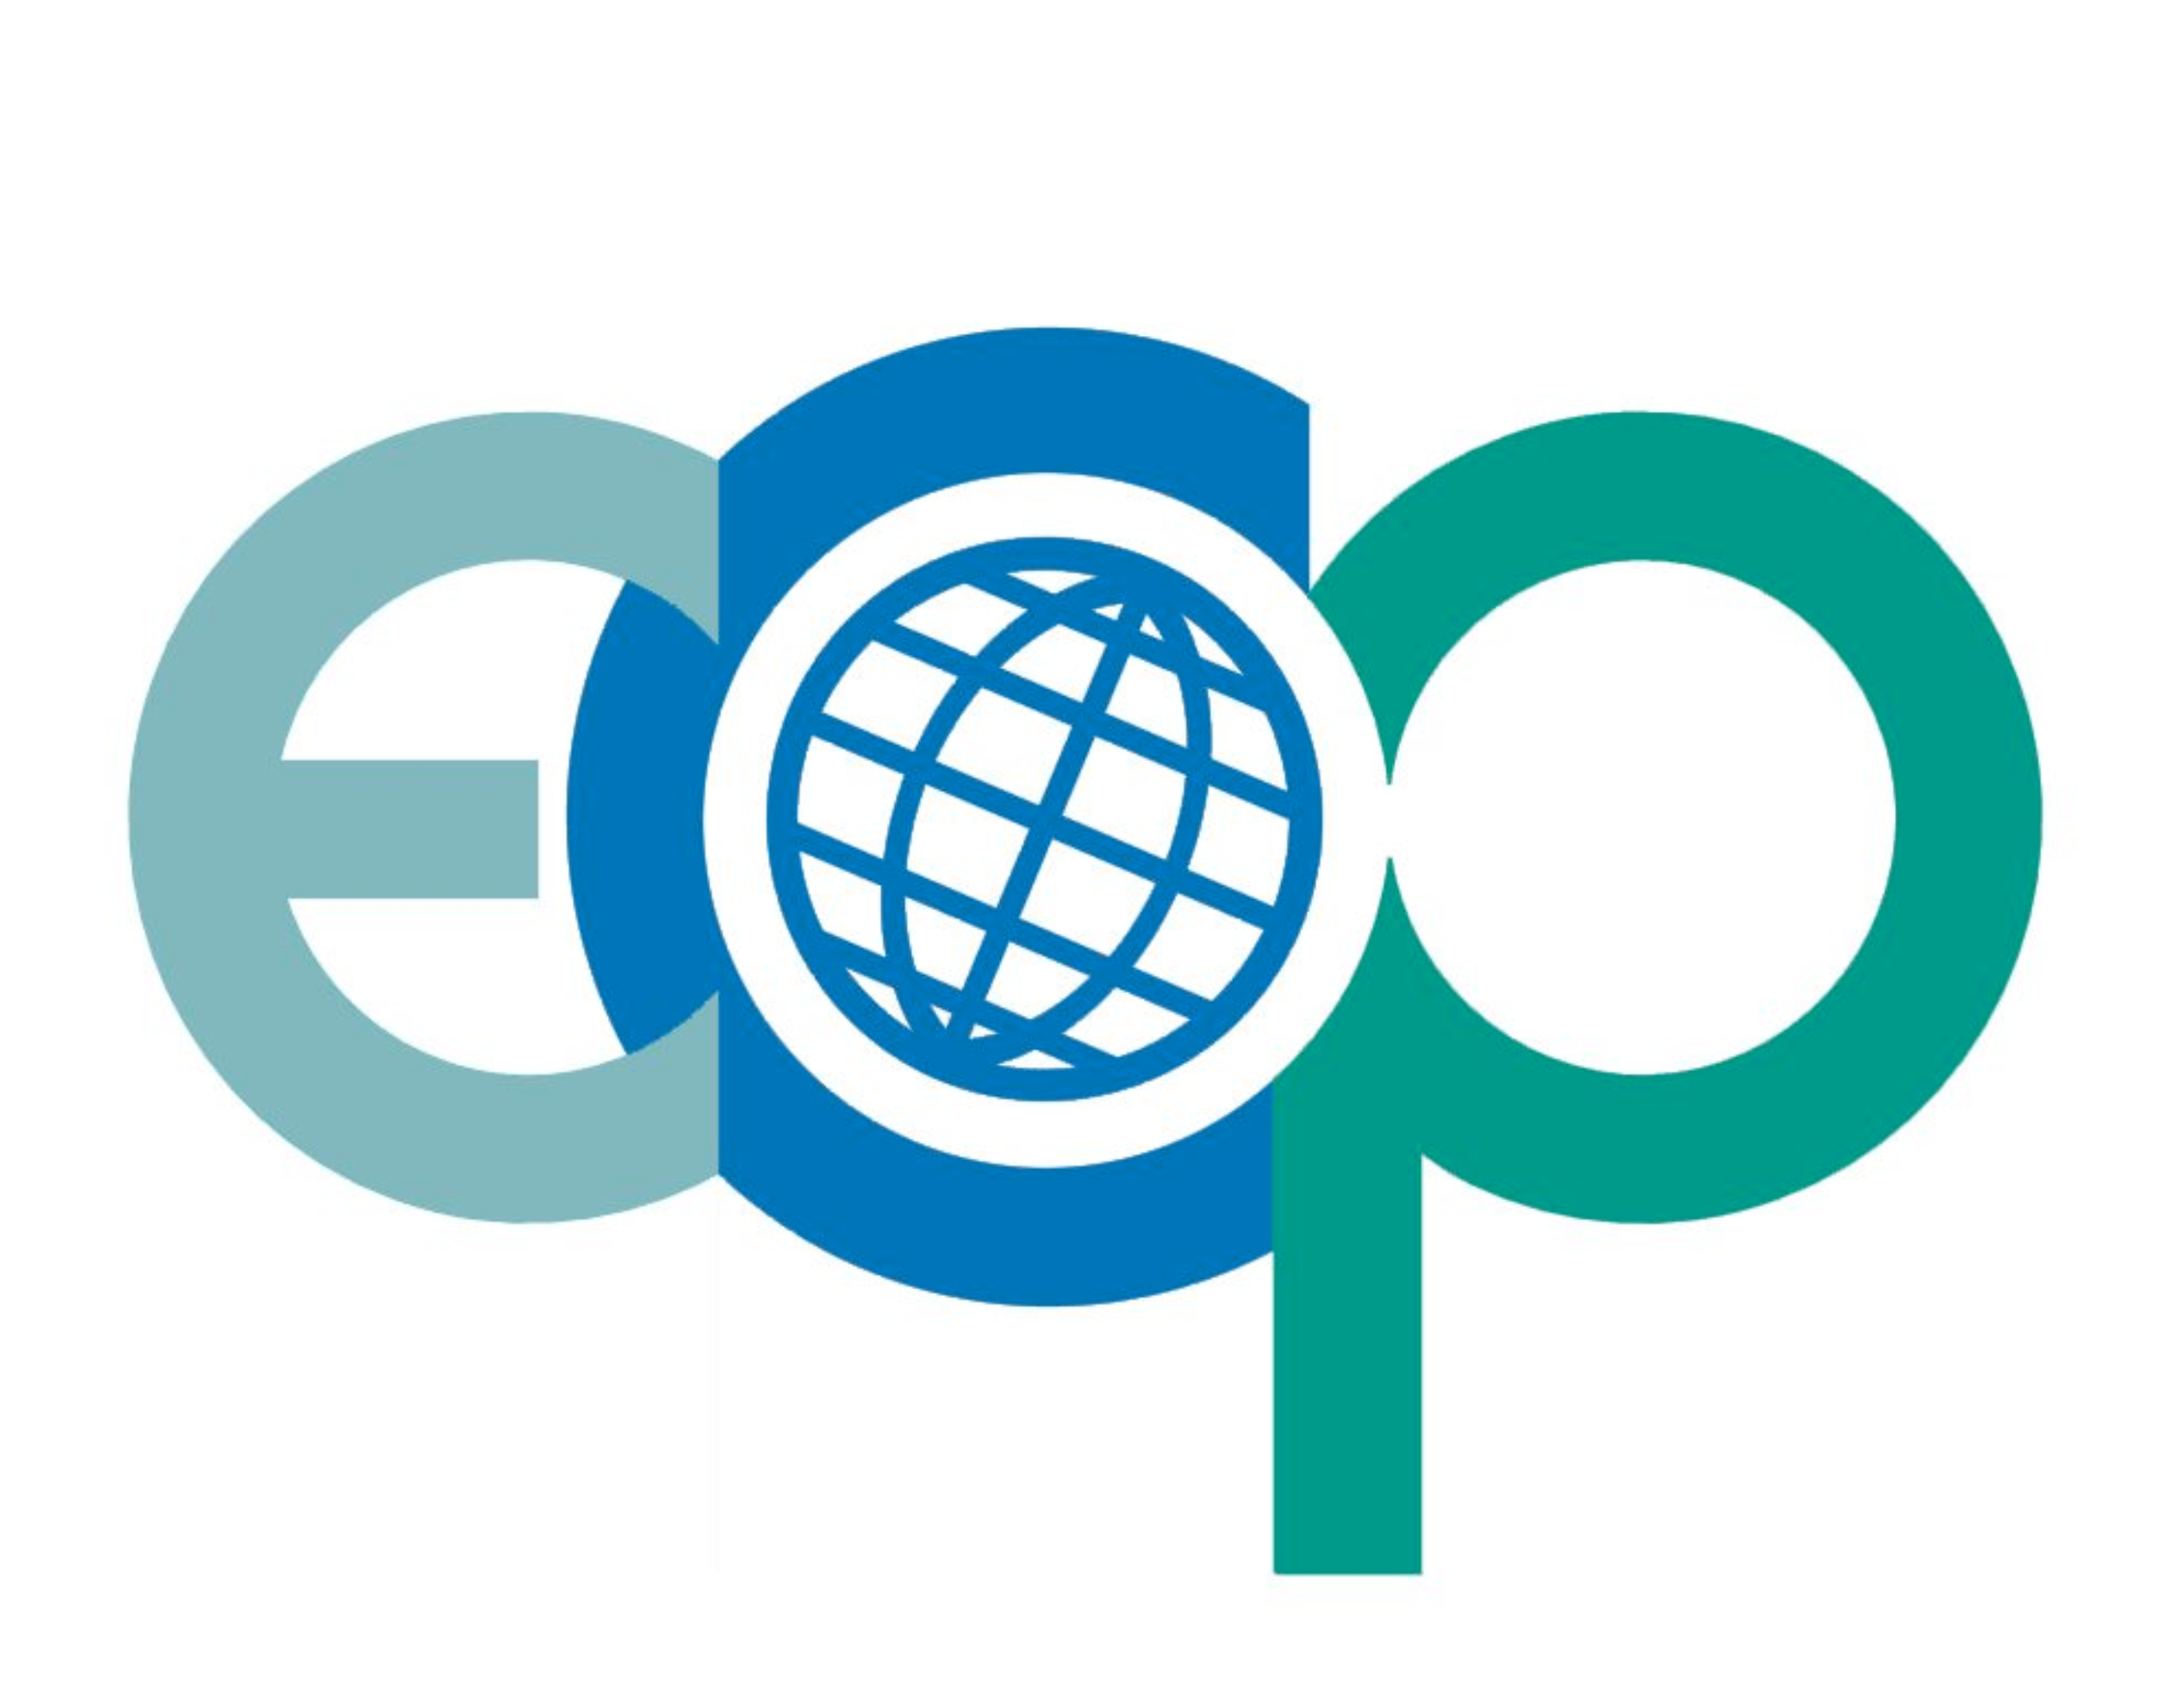 docs/source/_static/ecopo.png